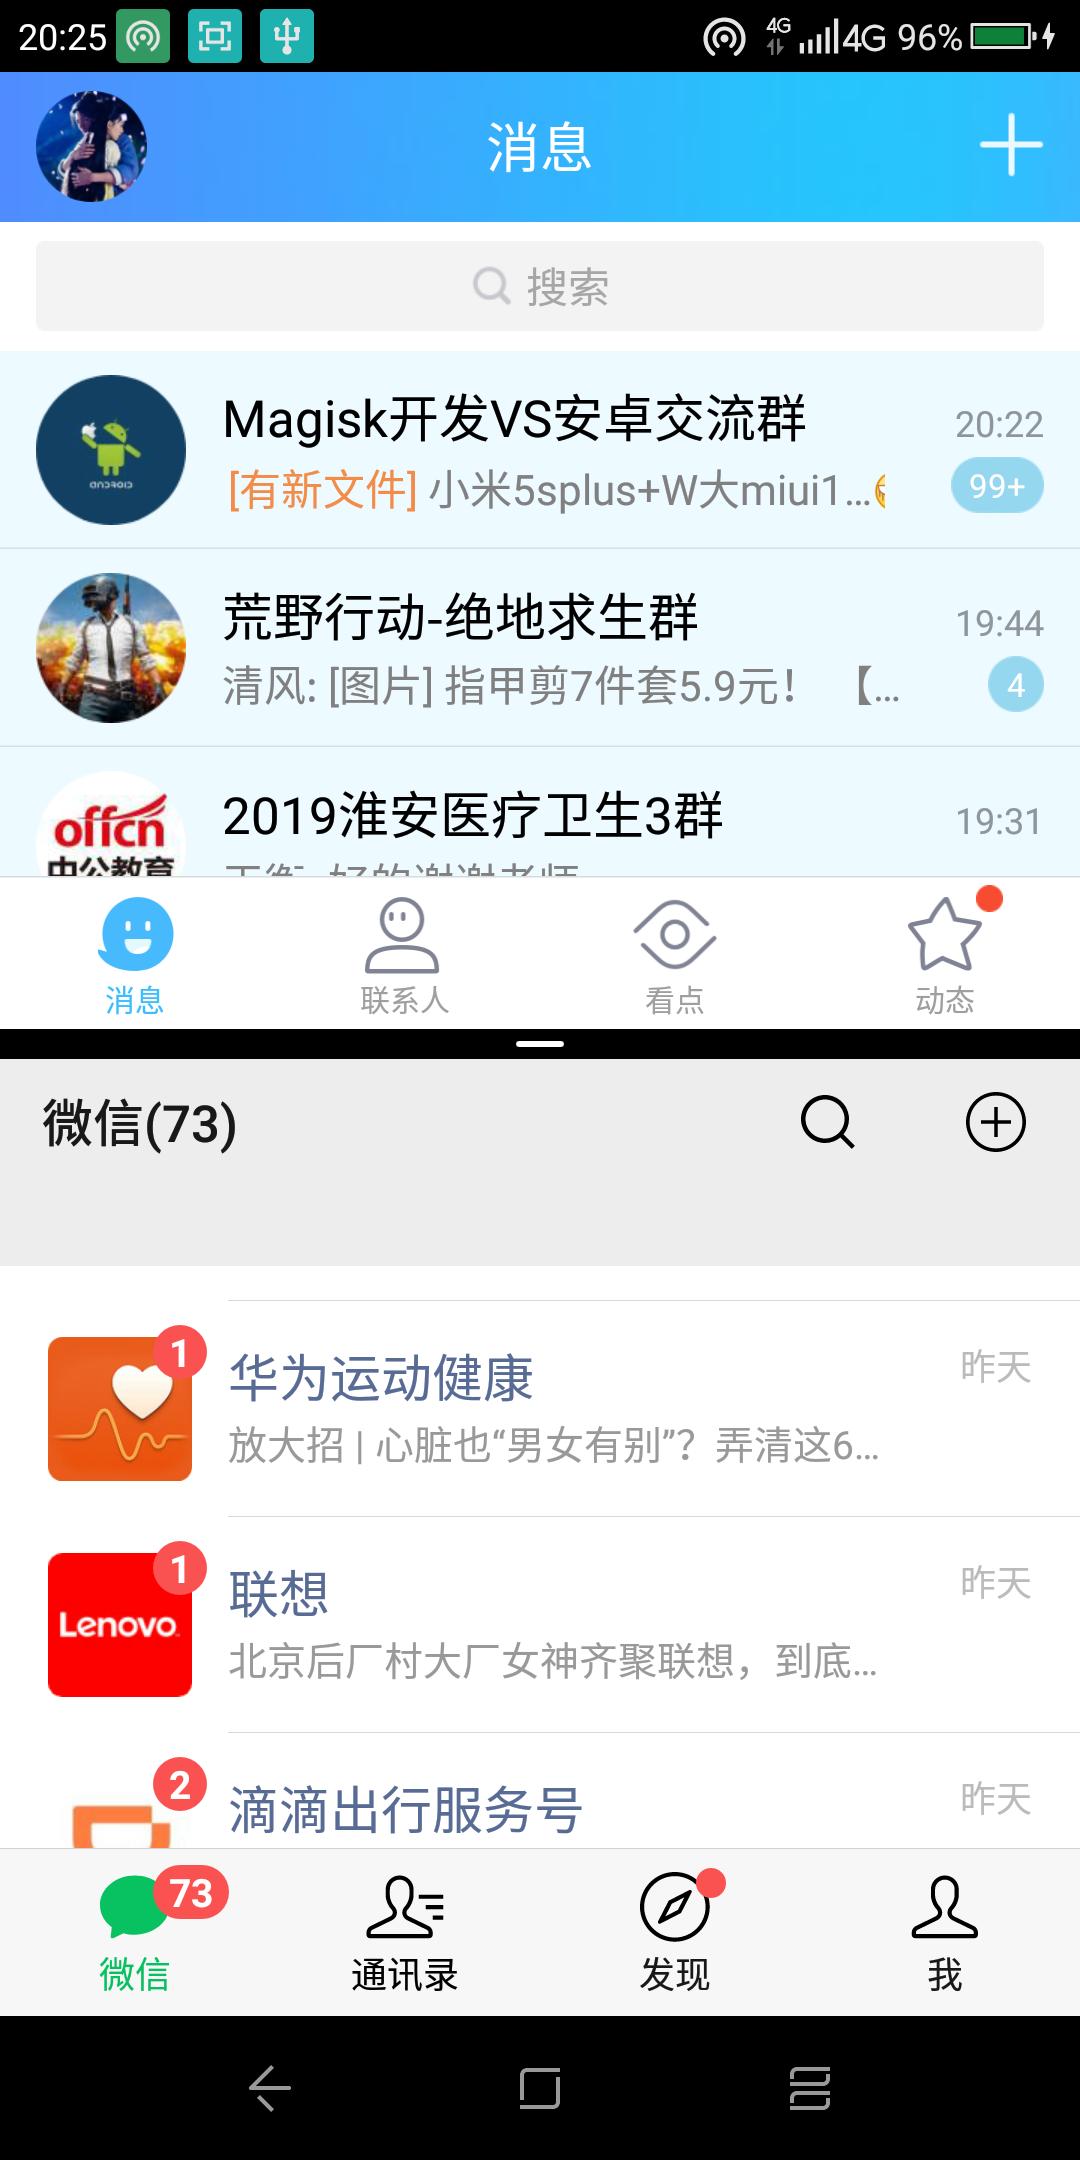 Screenshot_2019-03-09-20-25-50.png